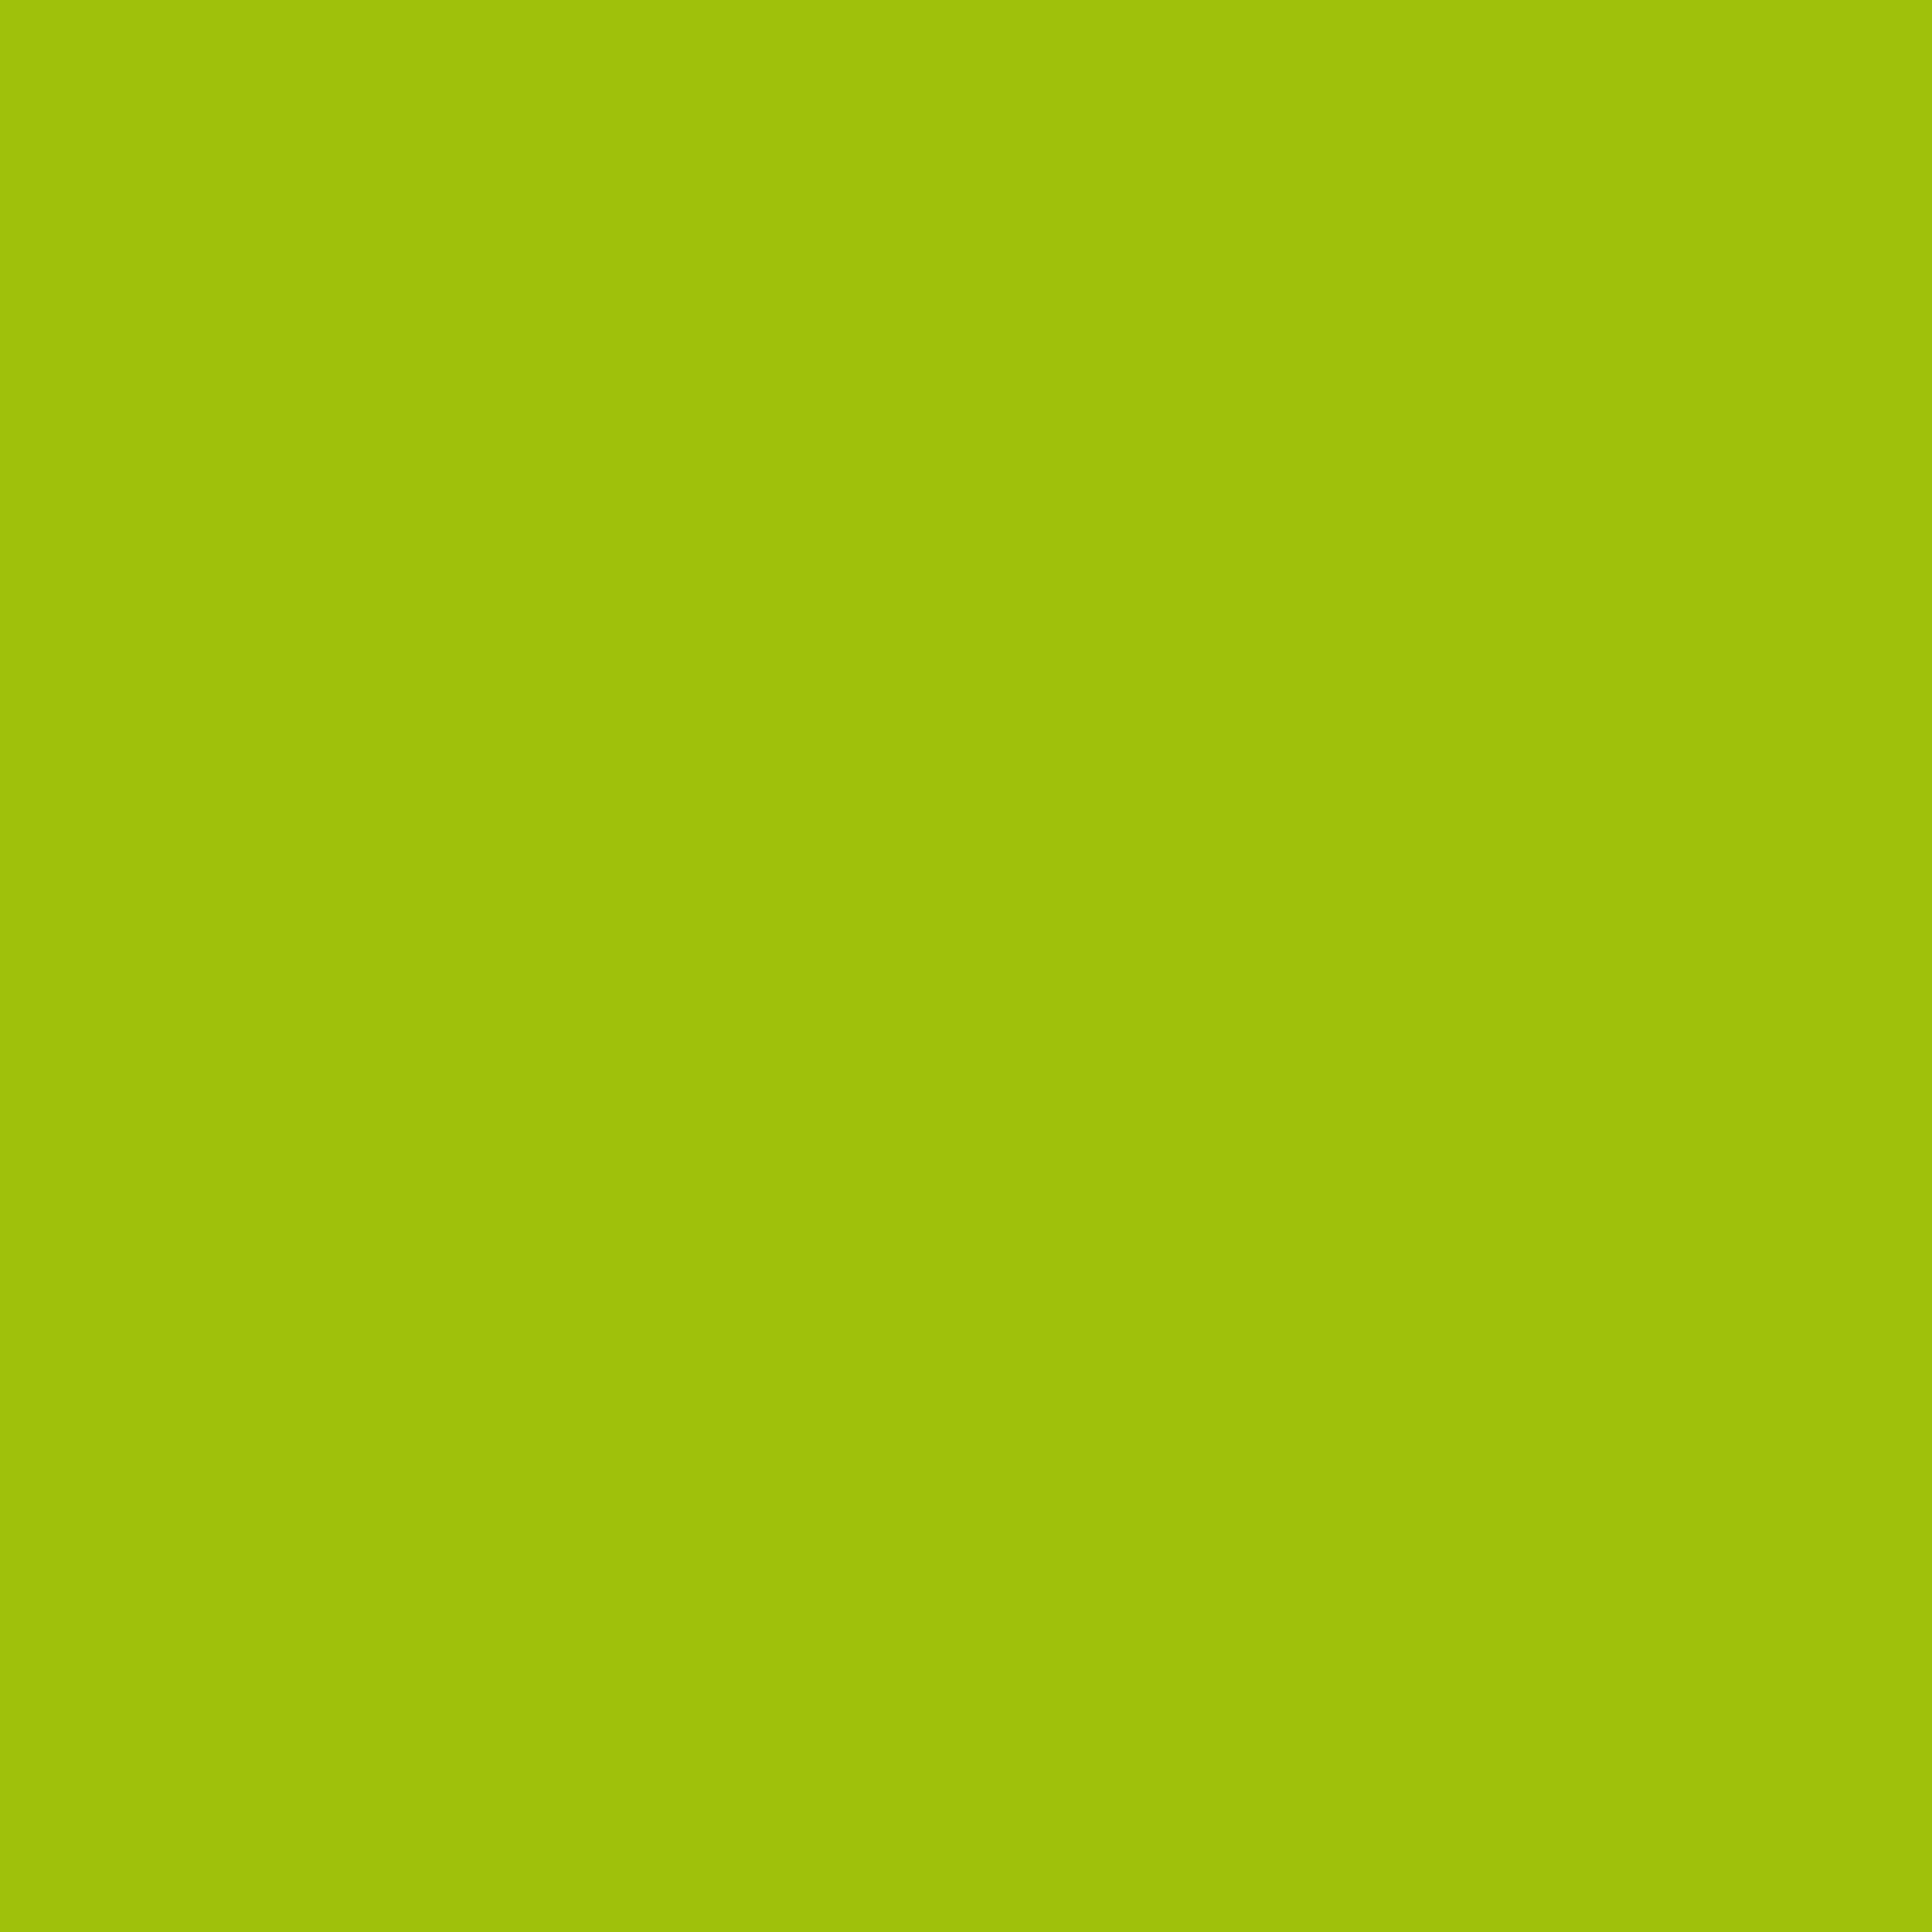 3600x3600 Limerick Solid Color Background